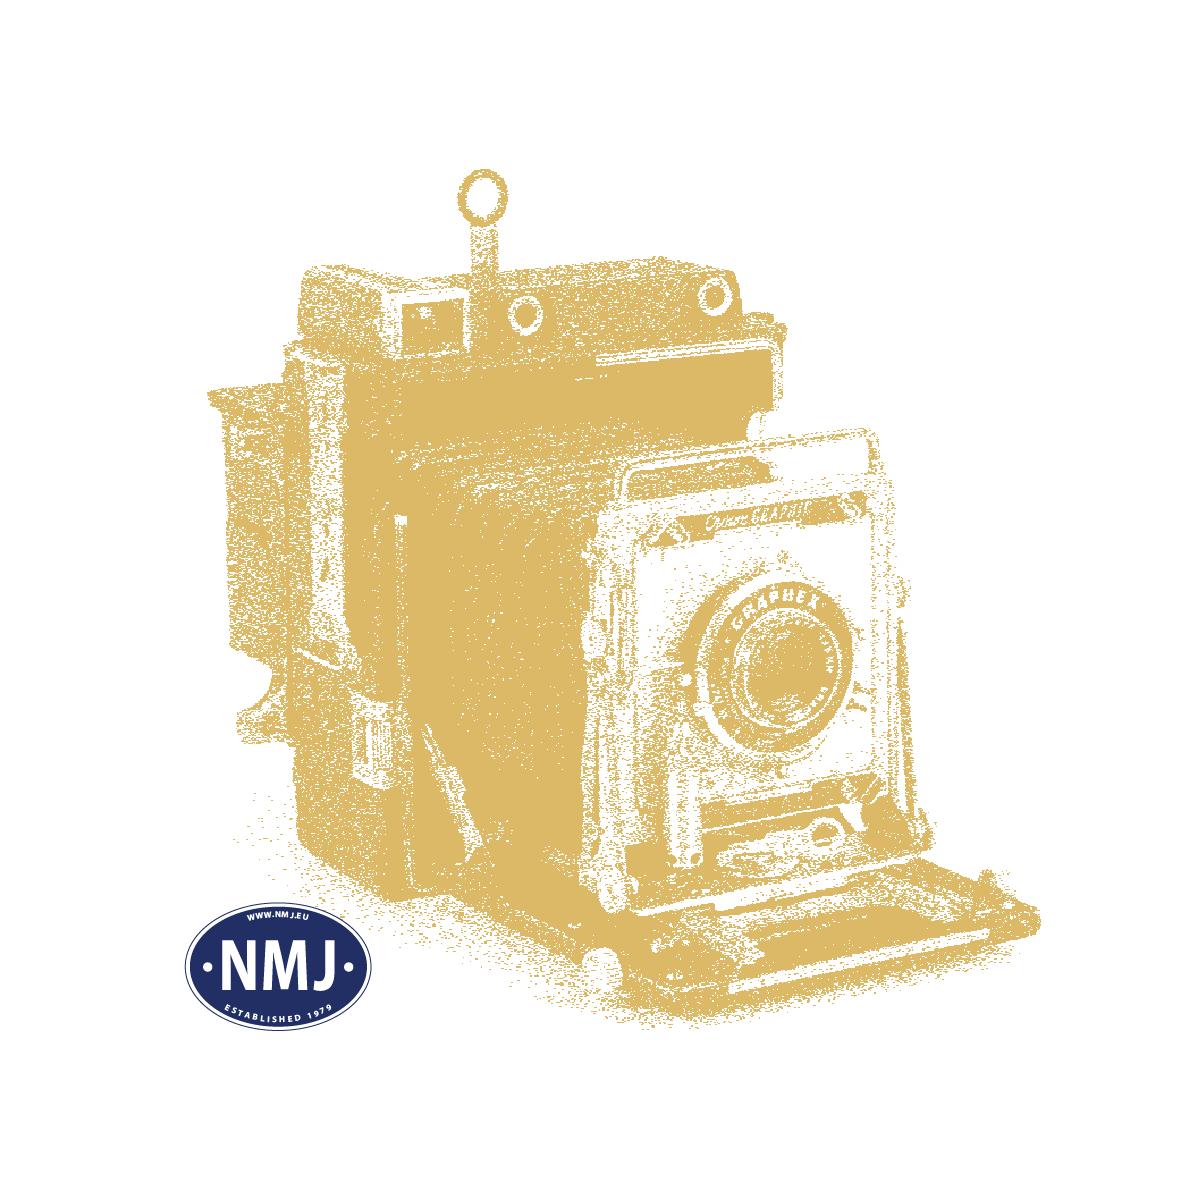 NMJSE901 - NMJ Superline SJ E 901